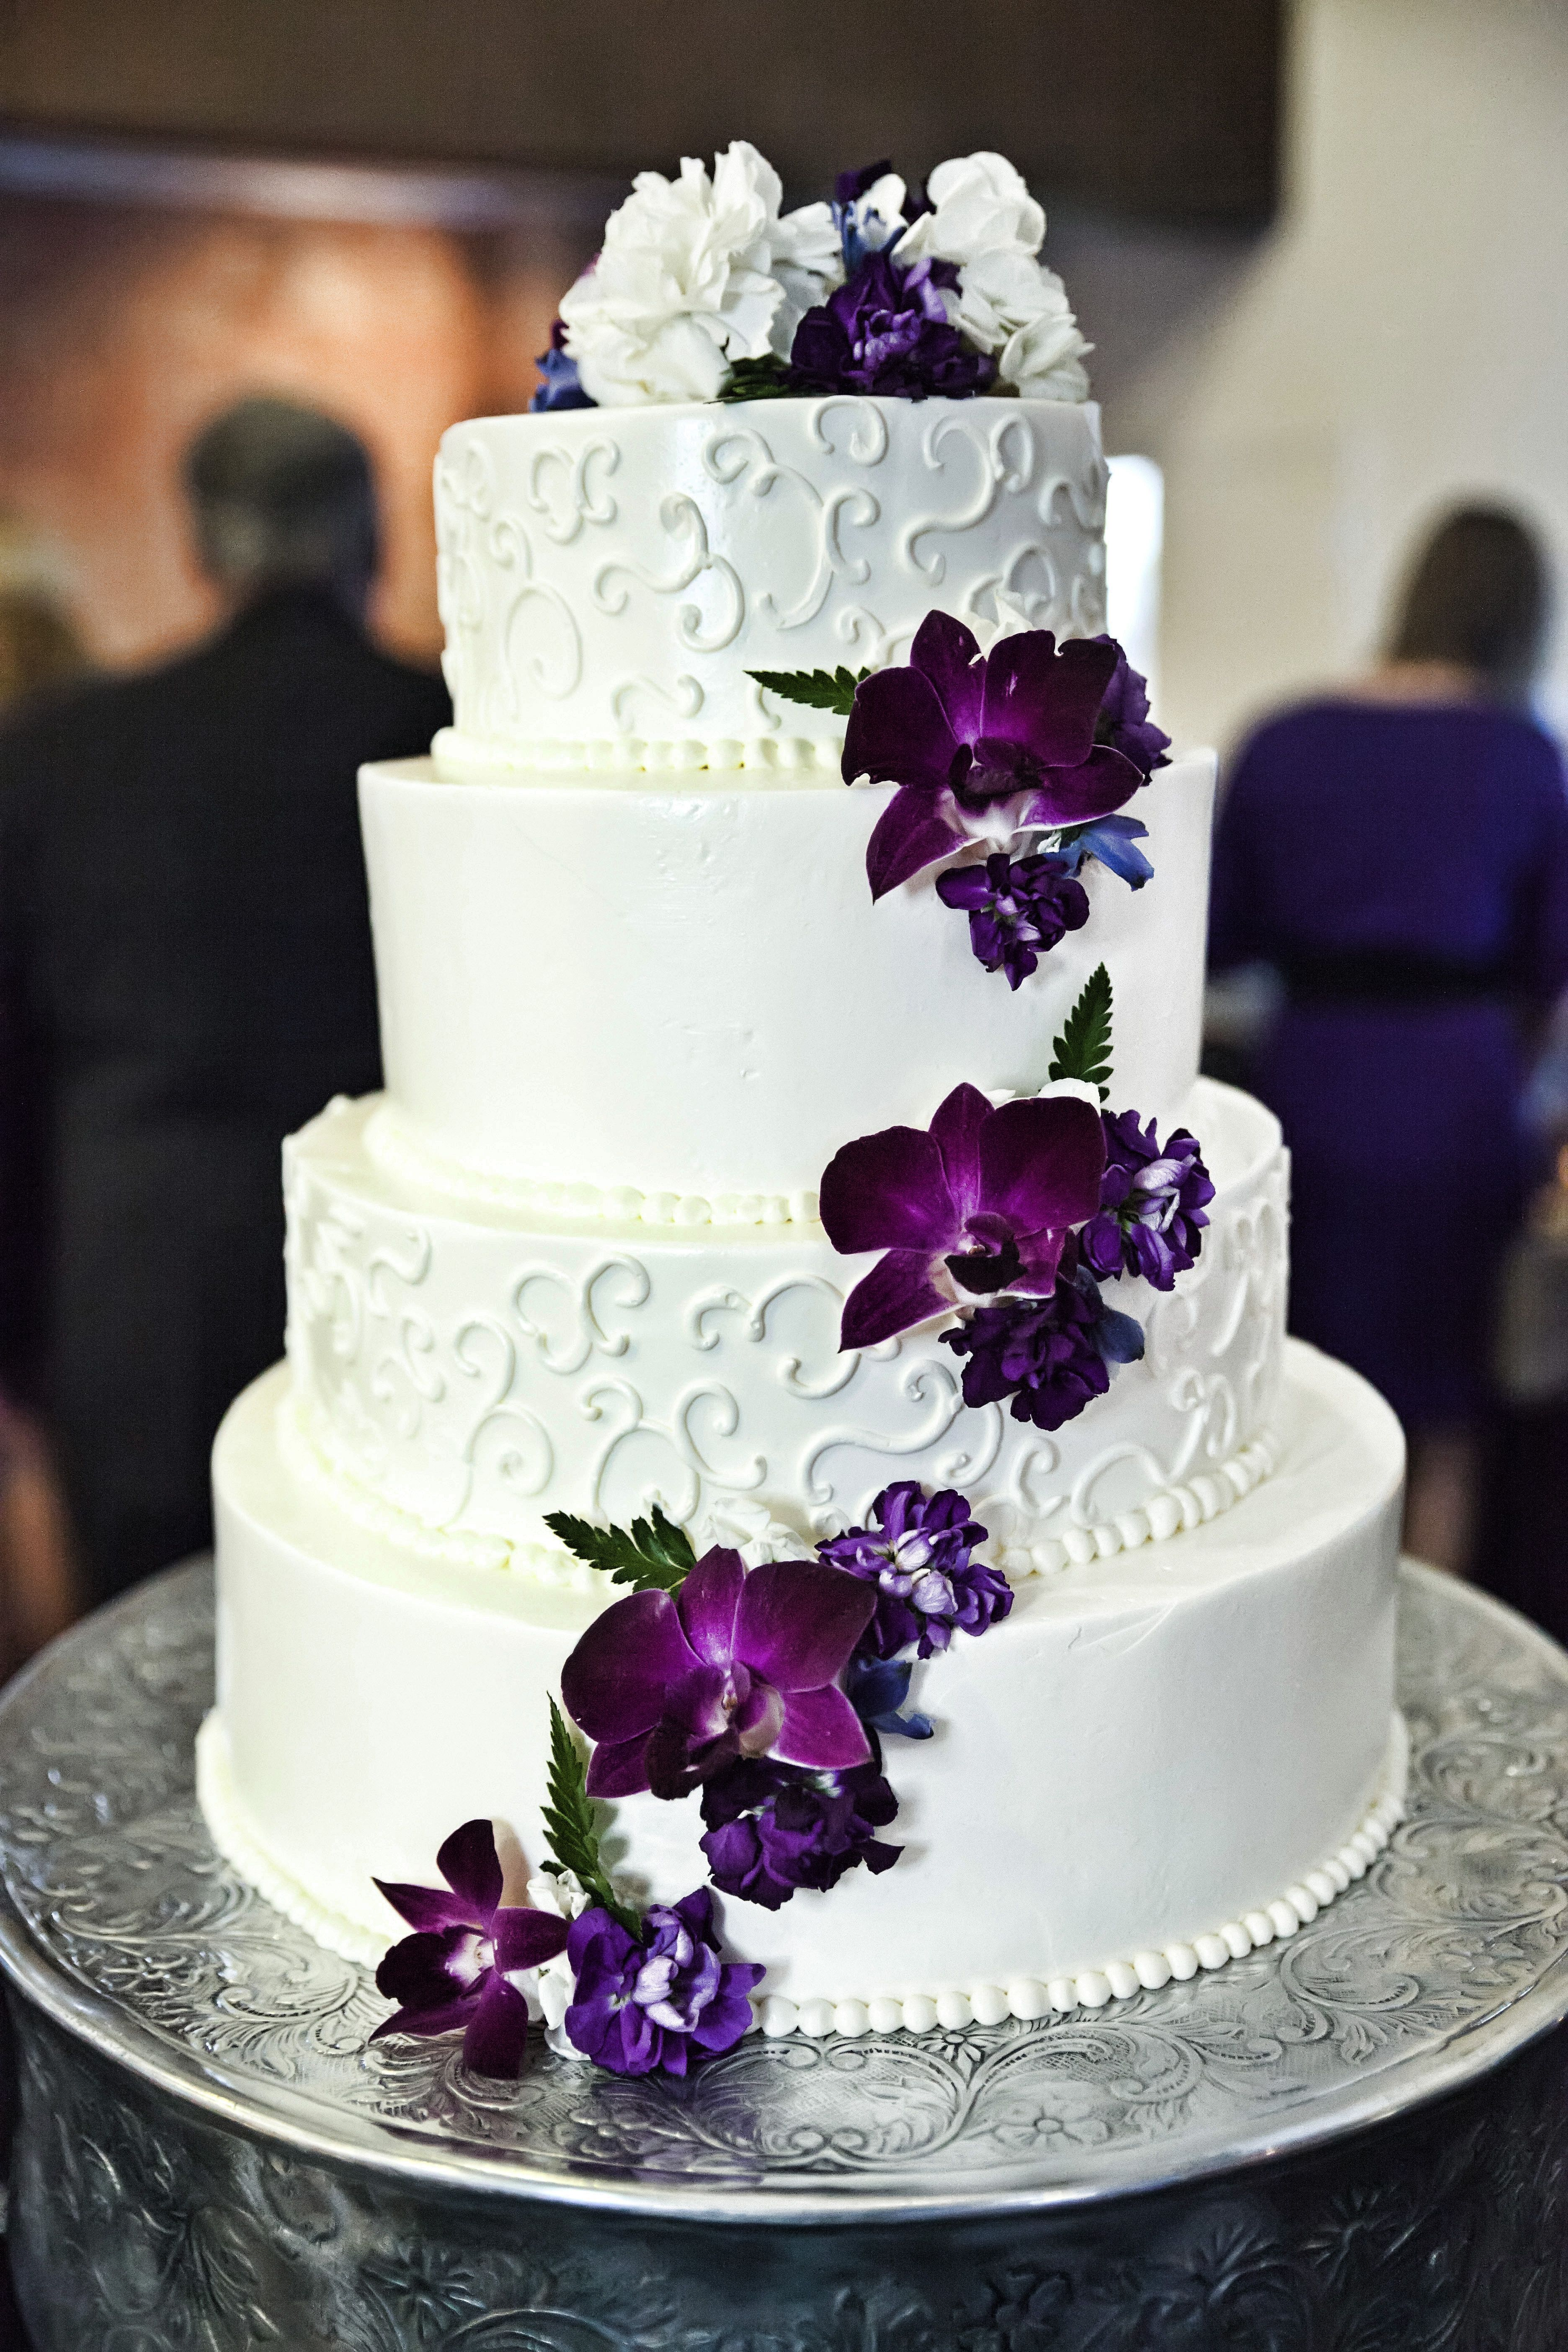 Free photo: Wedding cake - wedding, roses, ornaments - Non ...